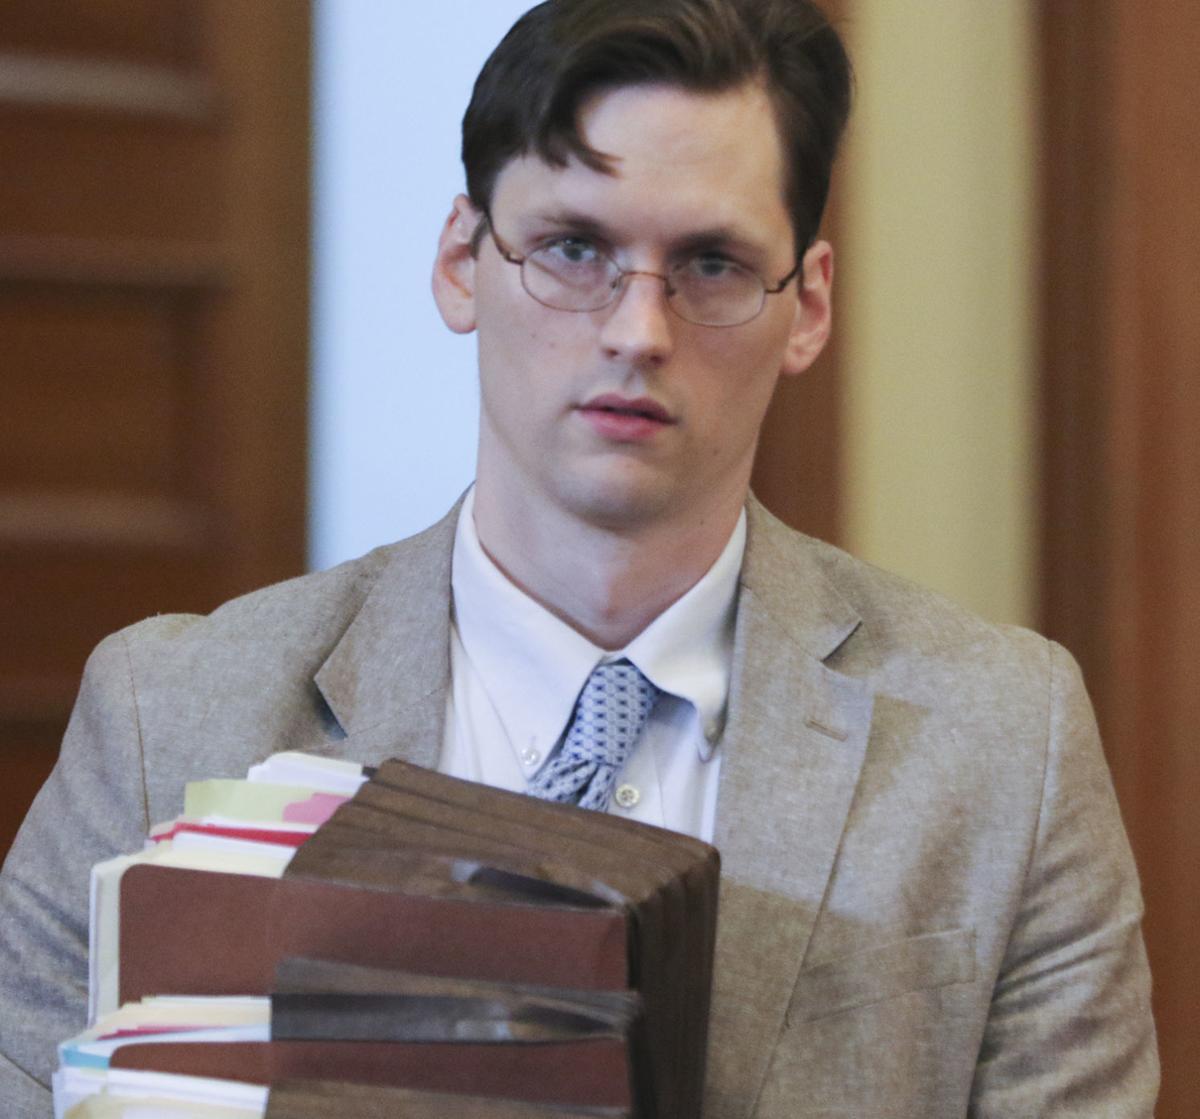 Barbour Prosecutor Thomas Hoxie